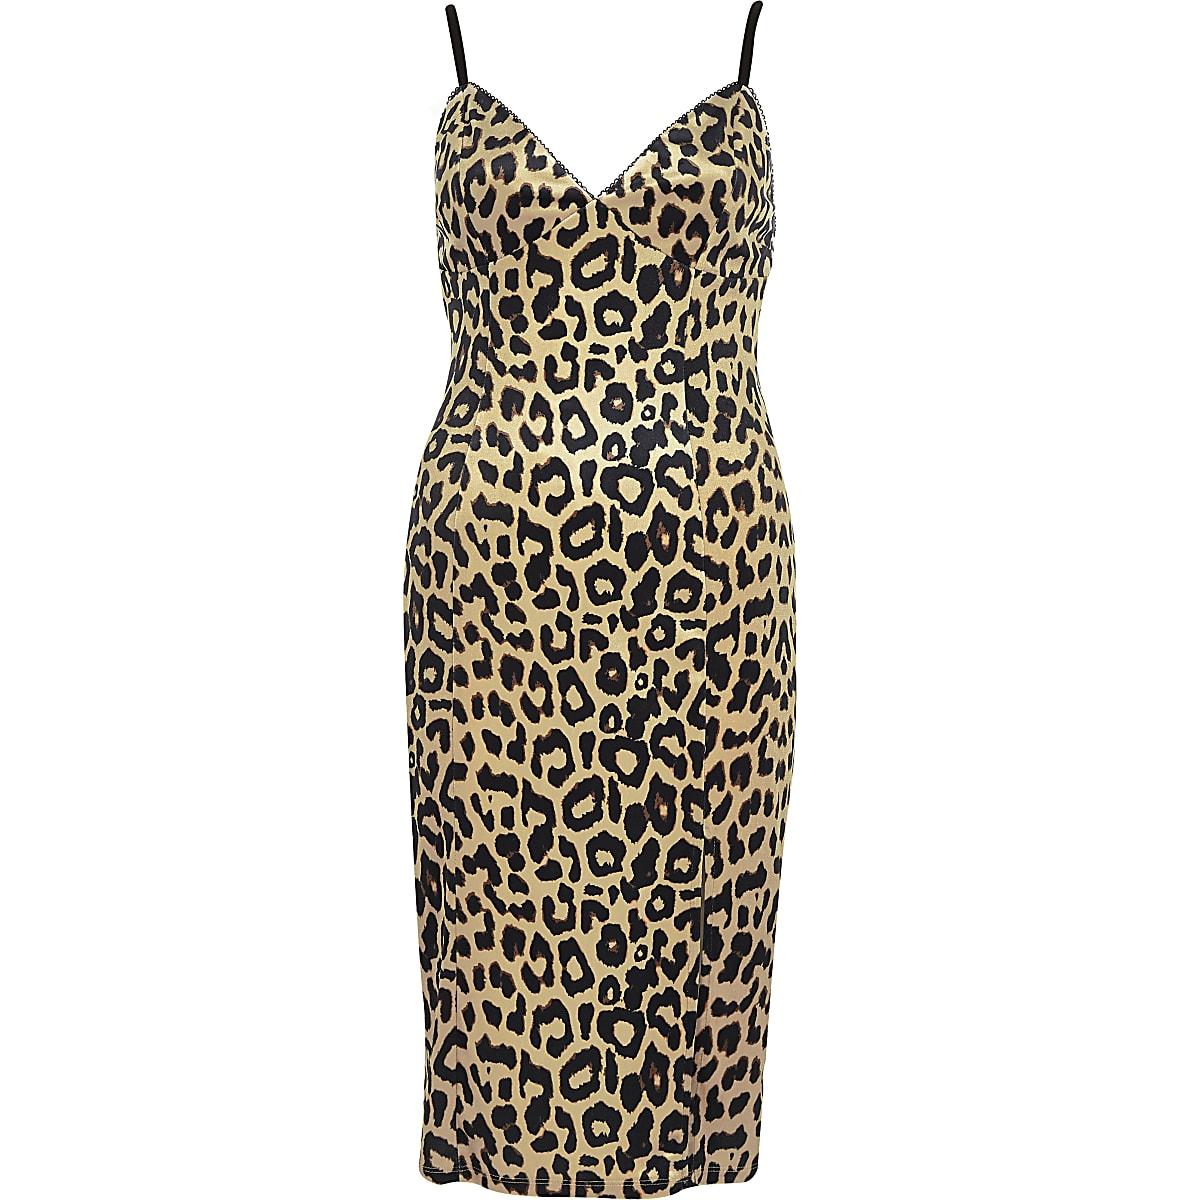 743b03ef4c61 Brown leopard print bodycon midi dress - Bodycon Dresses - Dresses ...